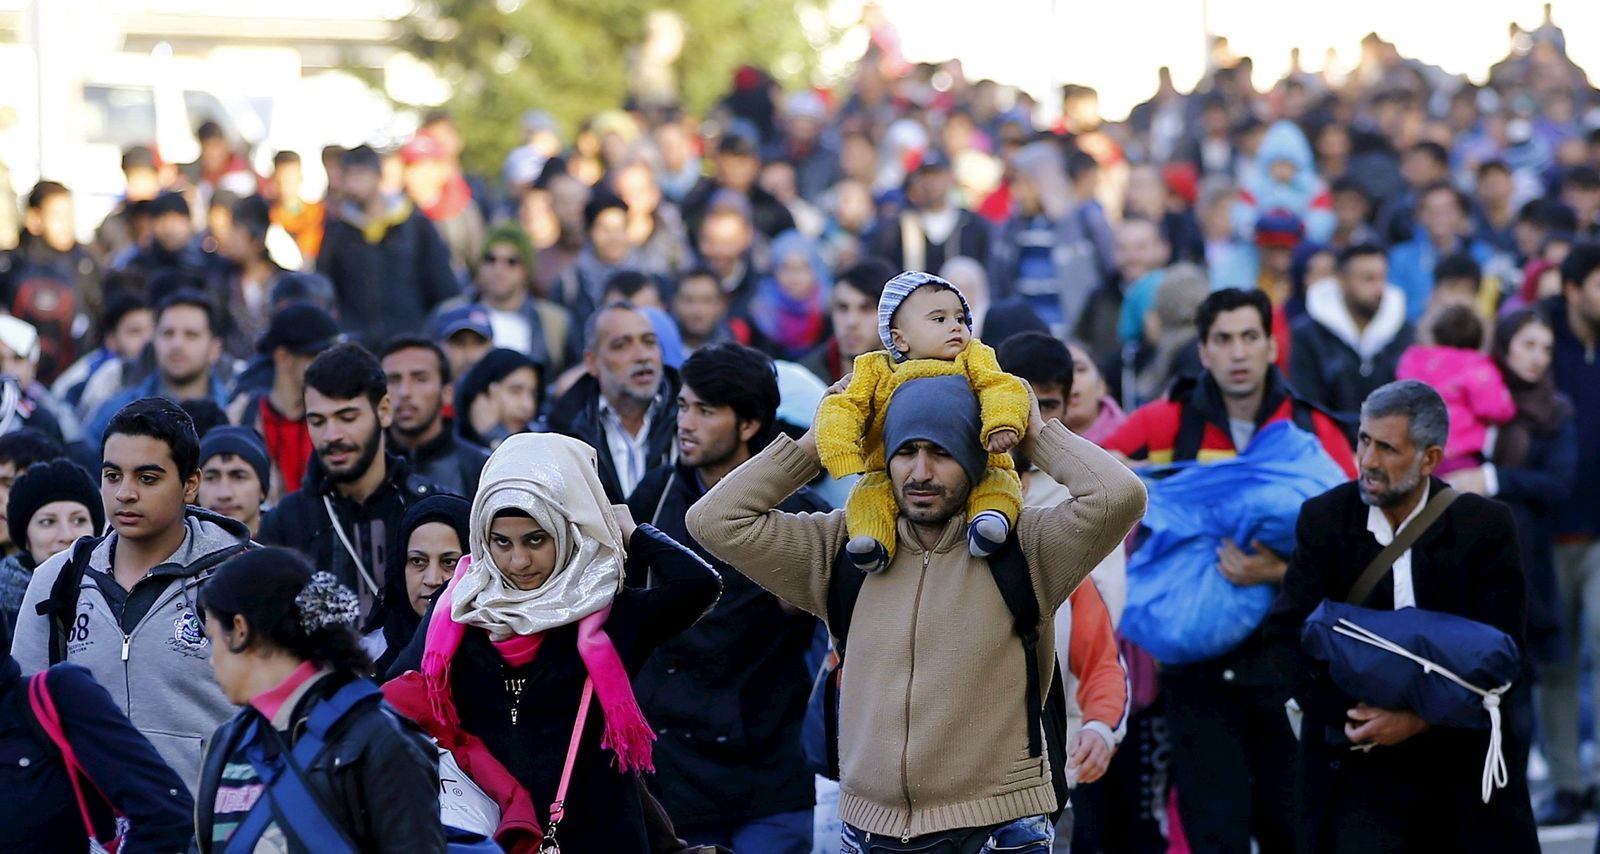 Flüchtlinge Slowenien Österreich